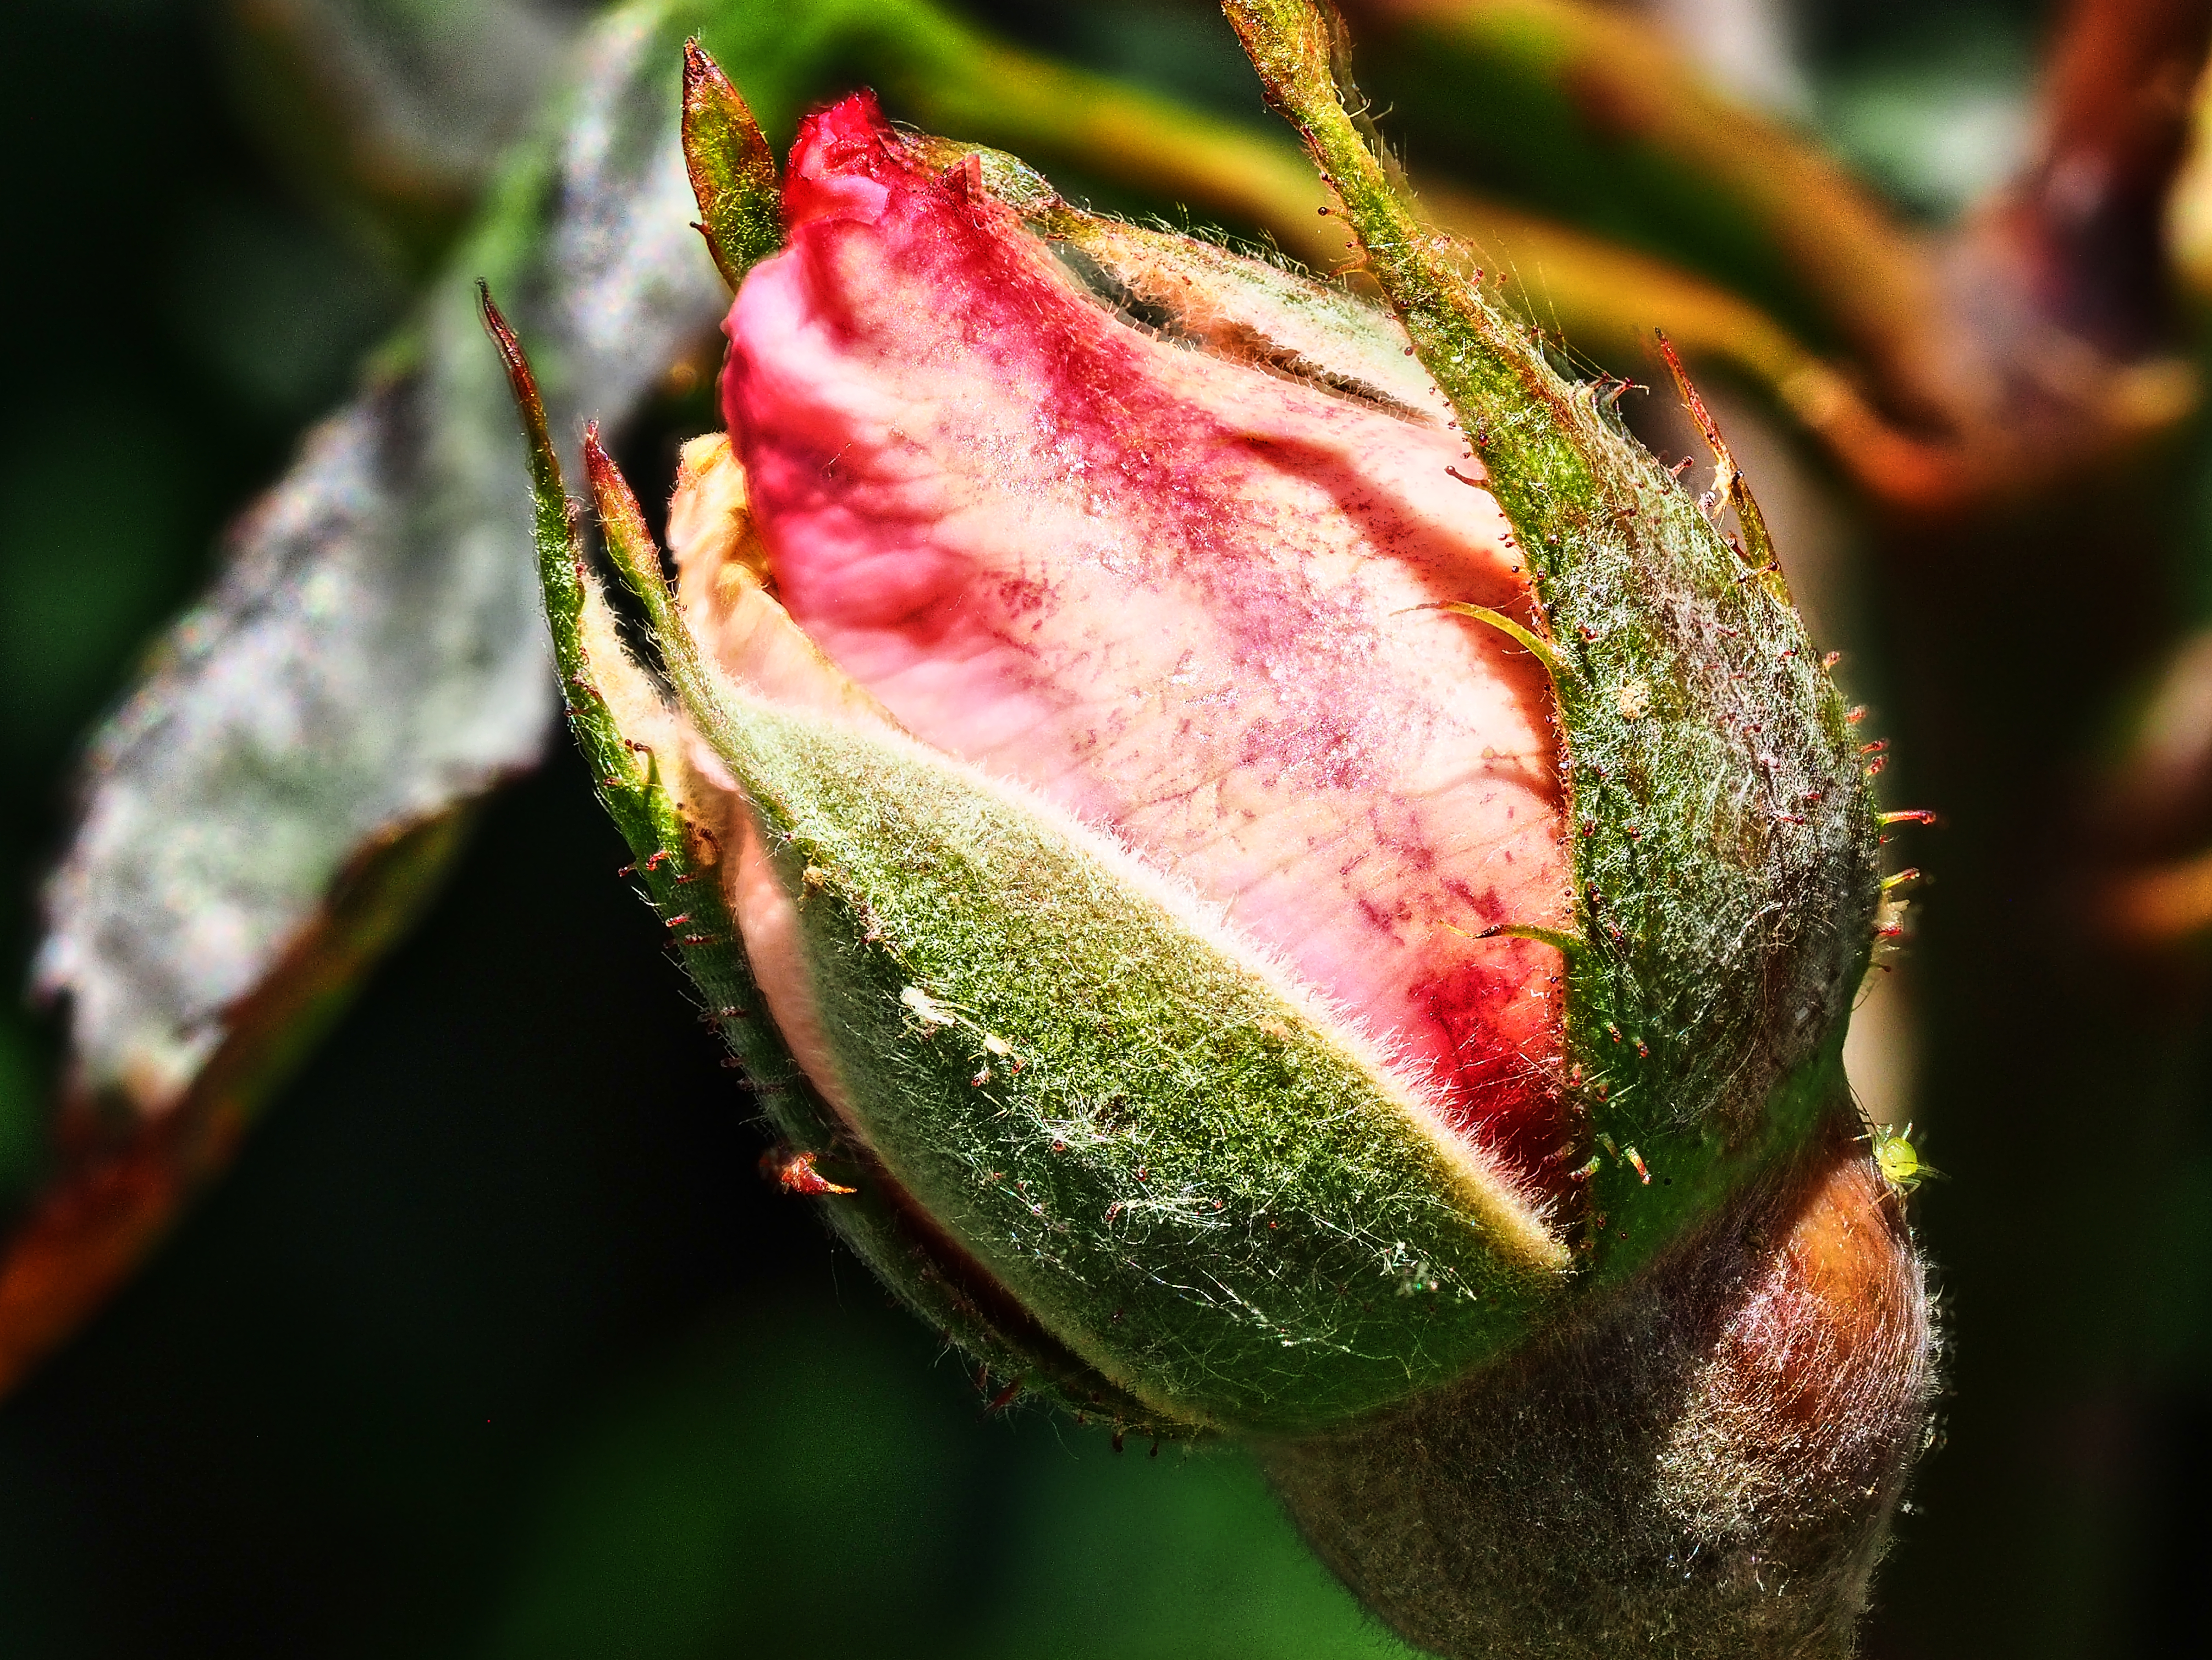 Rose mit Blattlaus